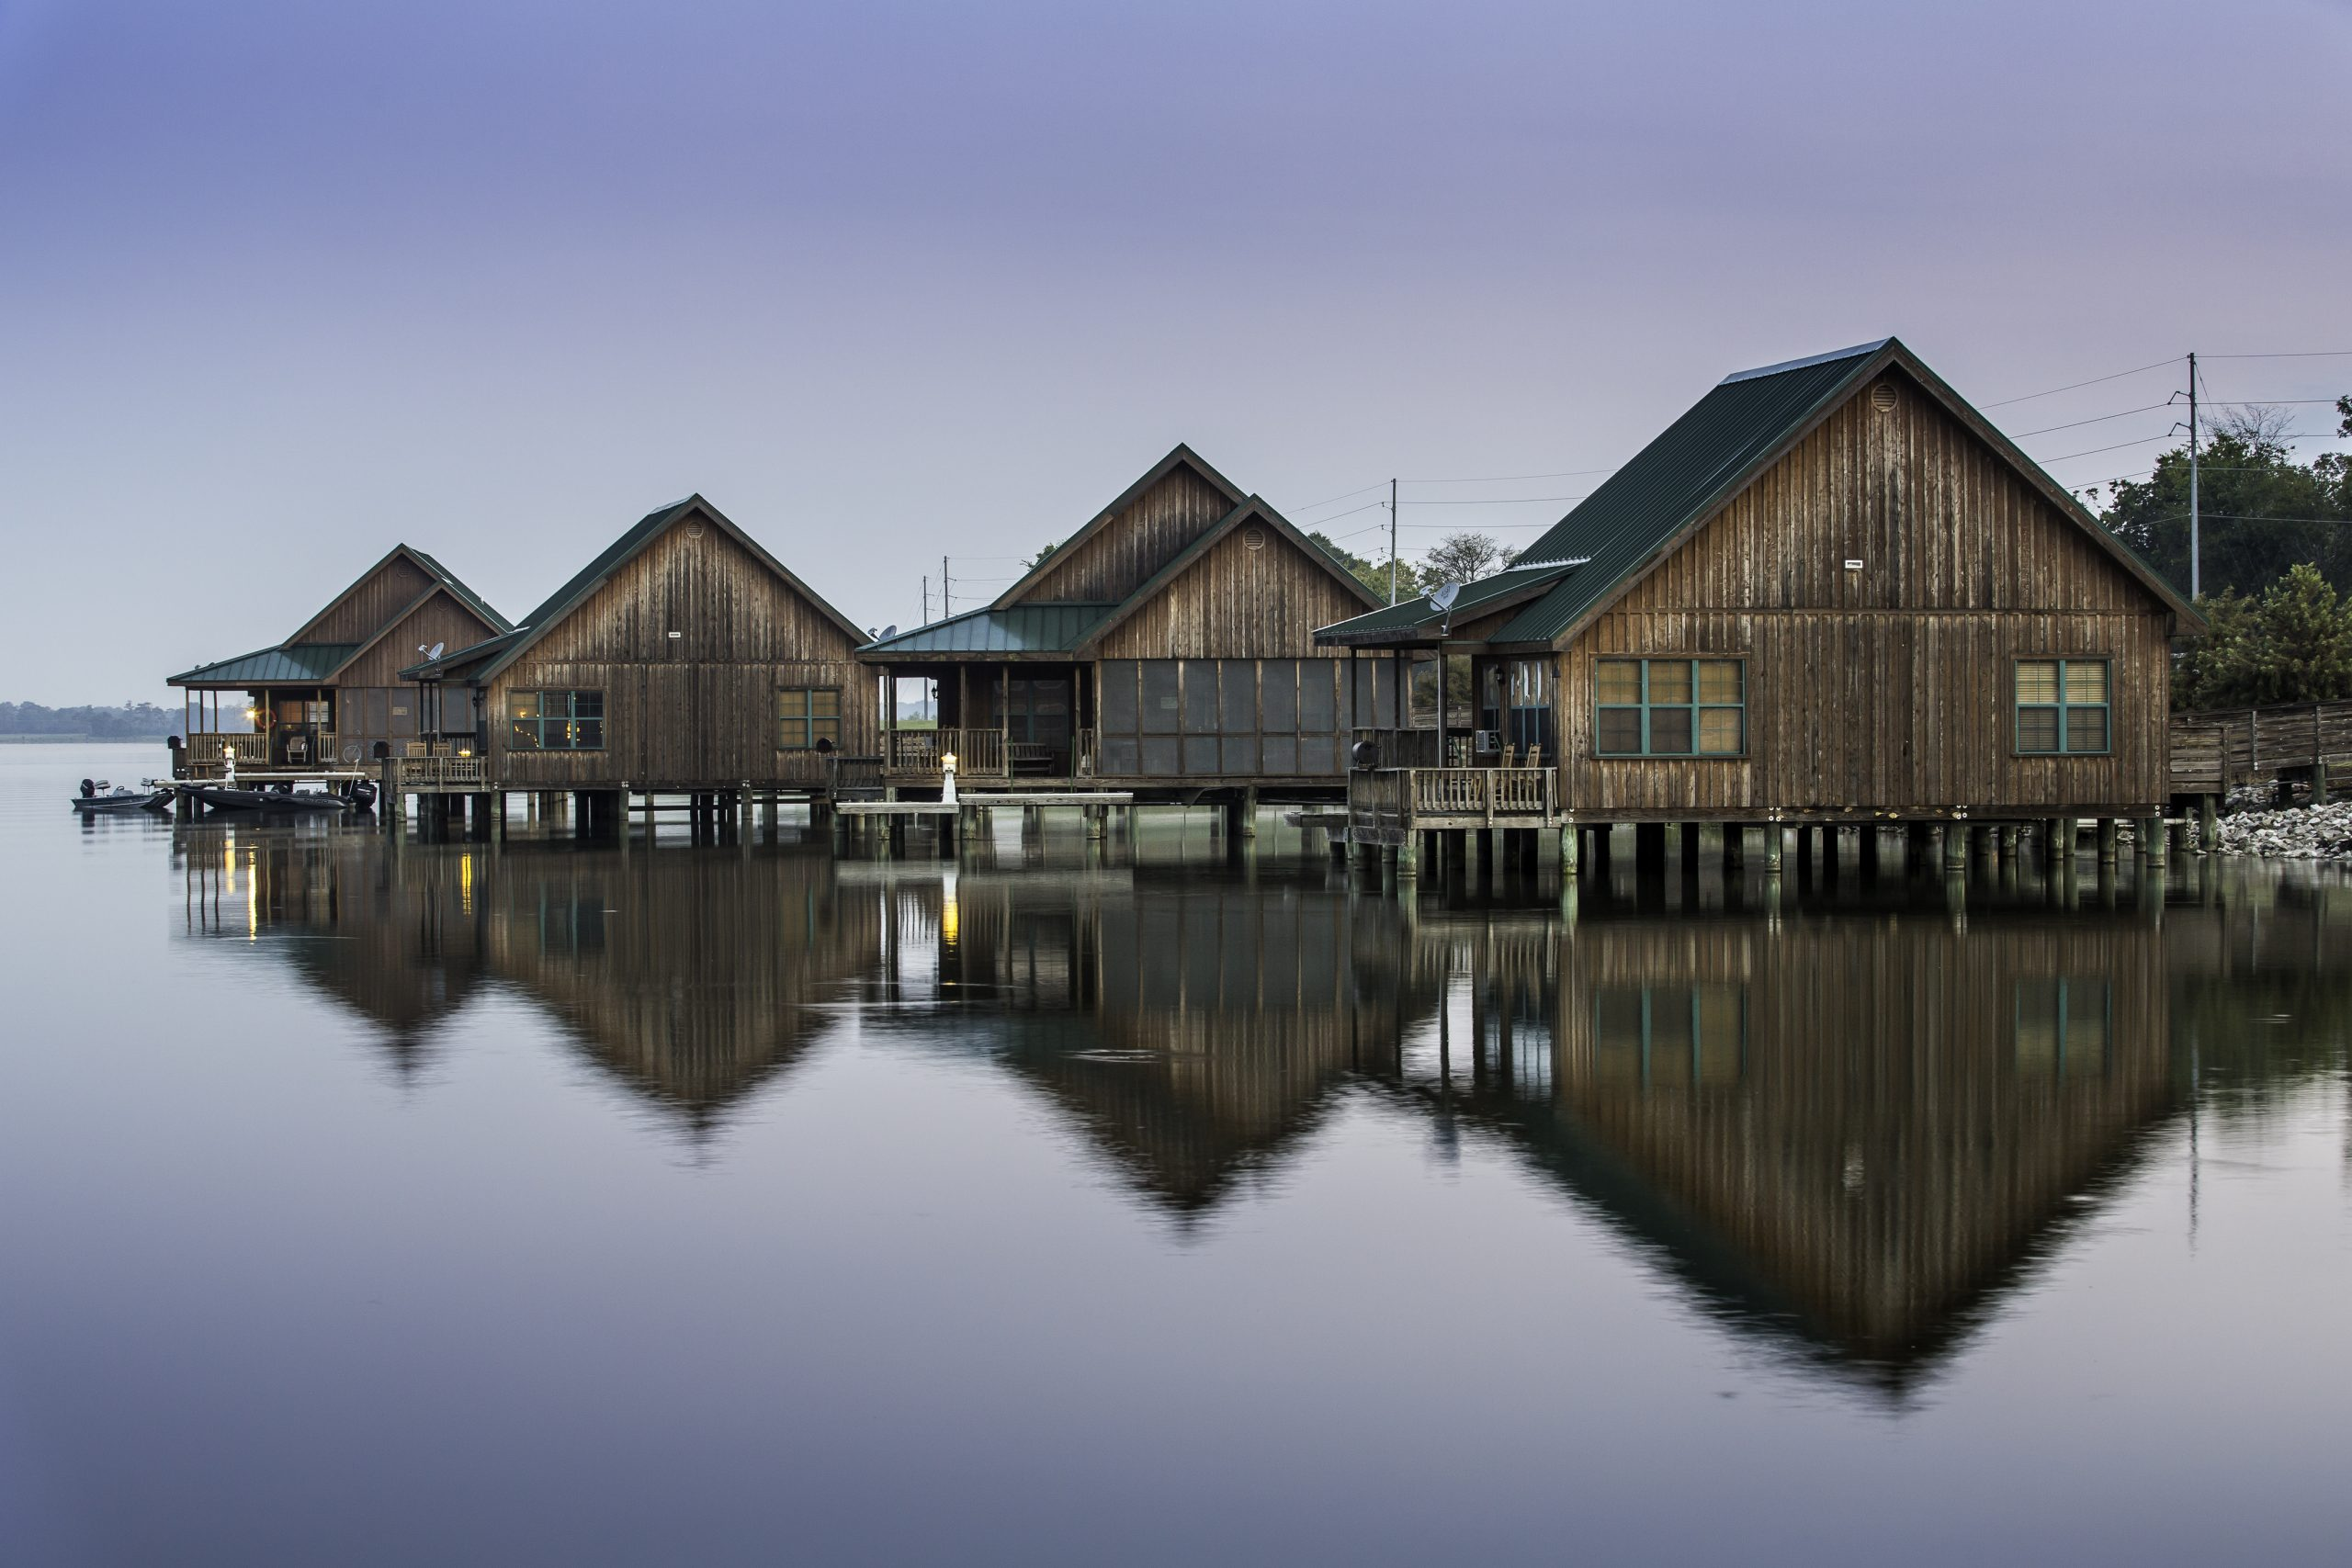 Louisiana State Parks, Monroe Poverty Point Reservoir